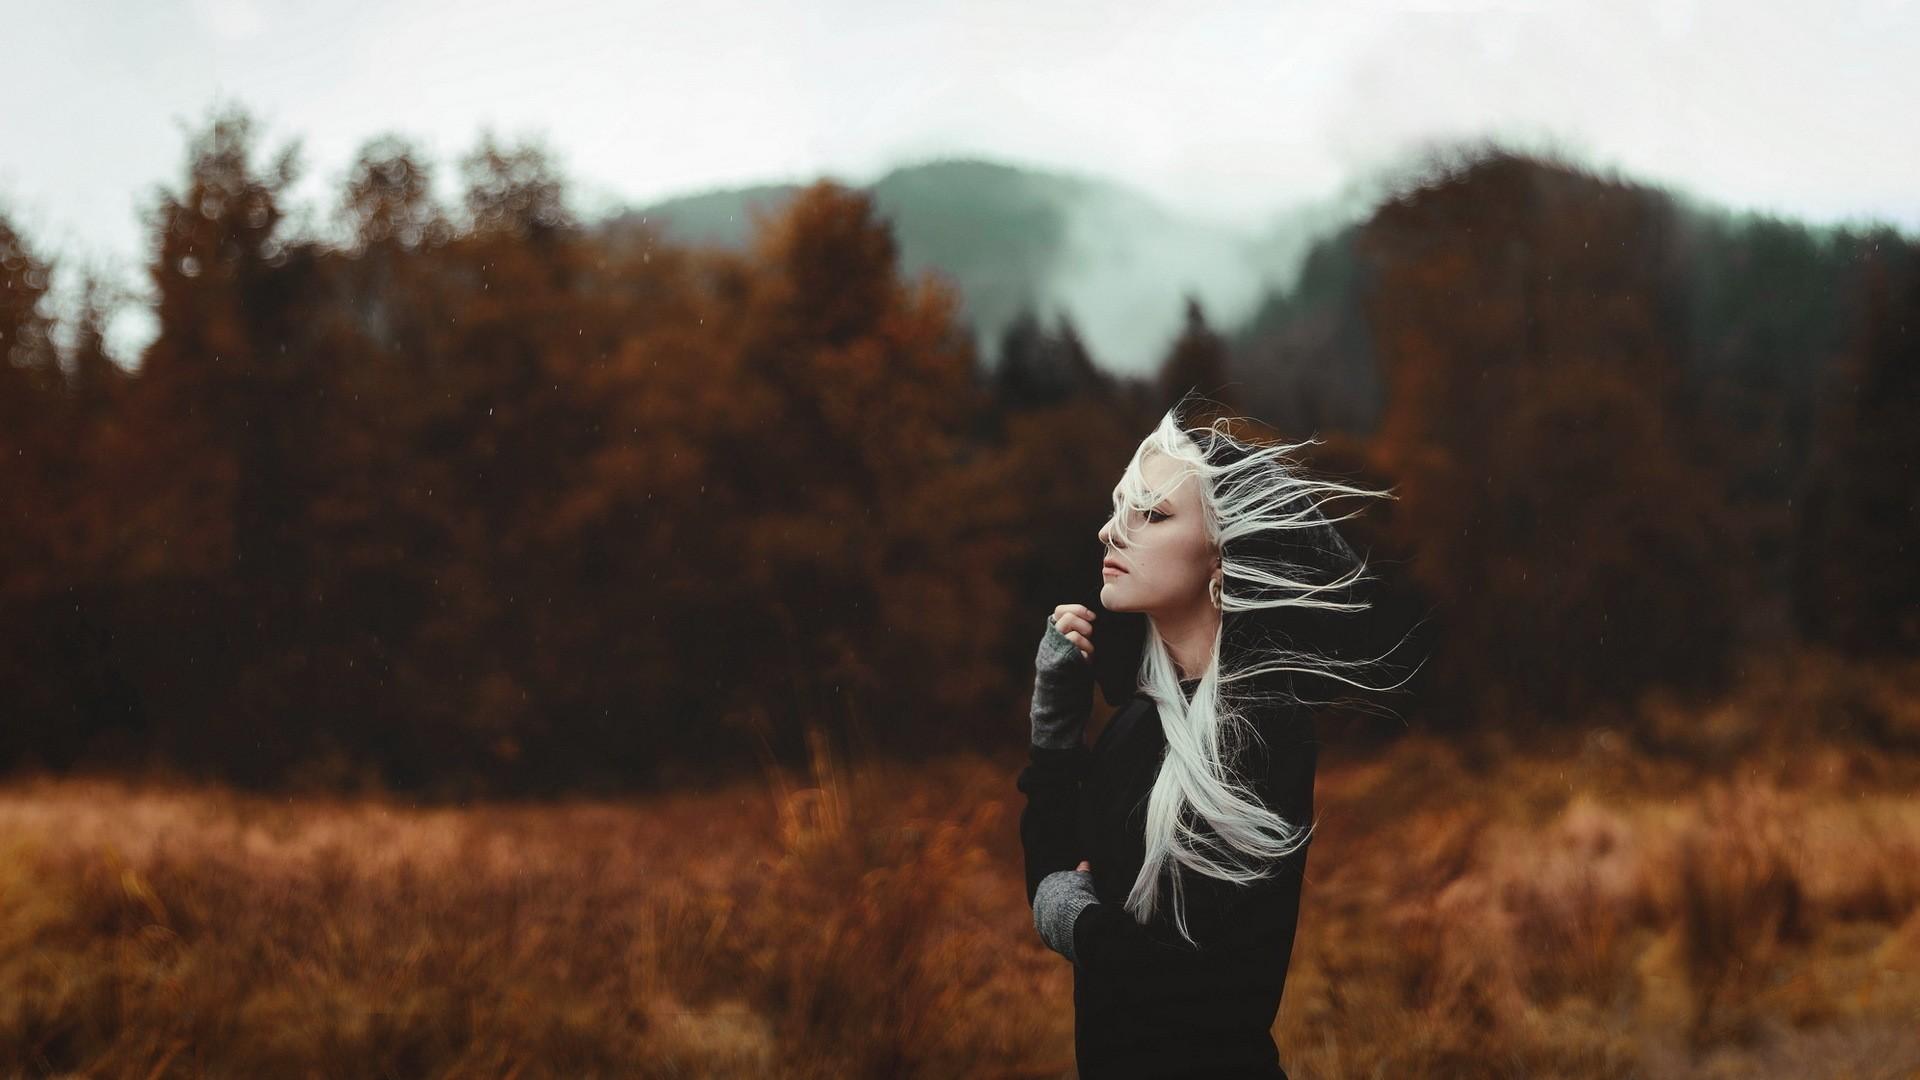 People 1920x1080 women women outdoors hoods windy Ash blonde blonde black clothing